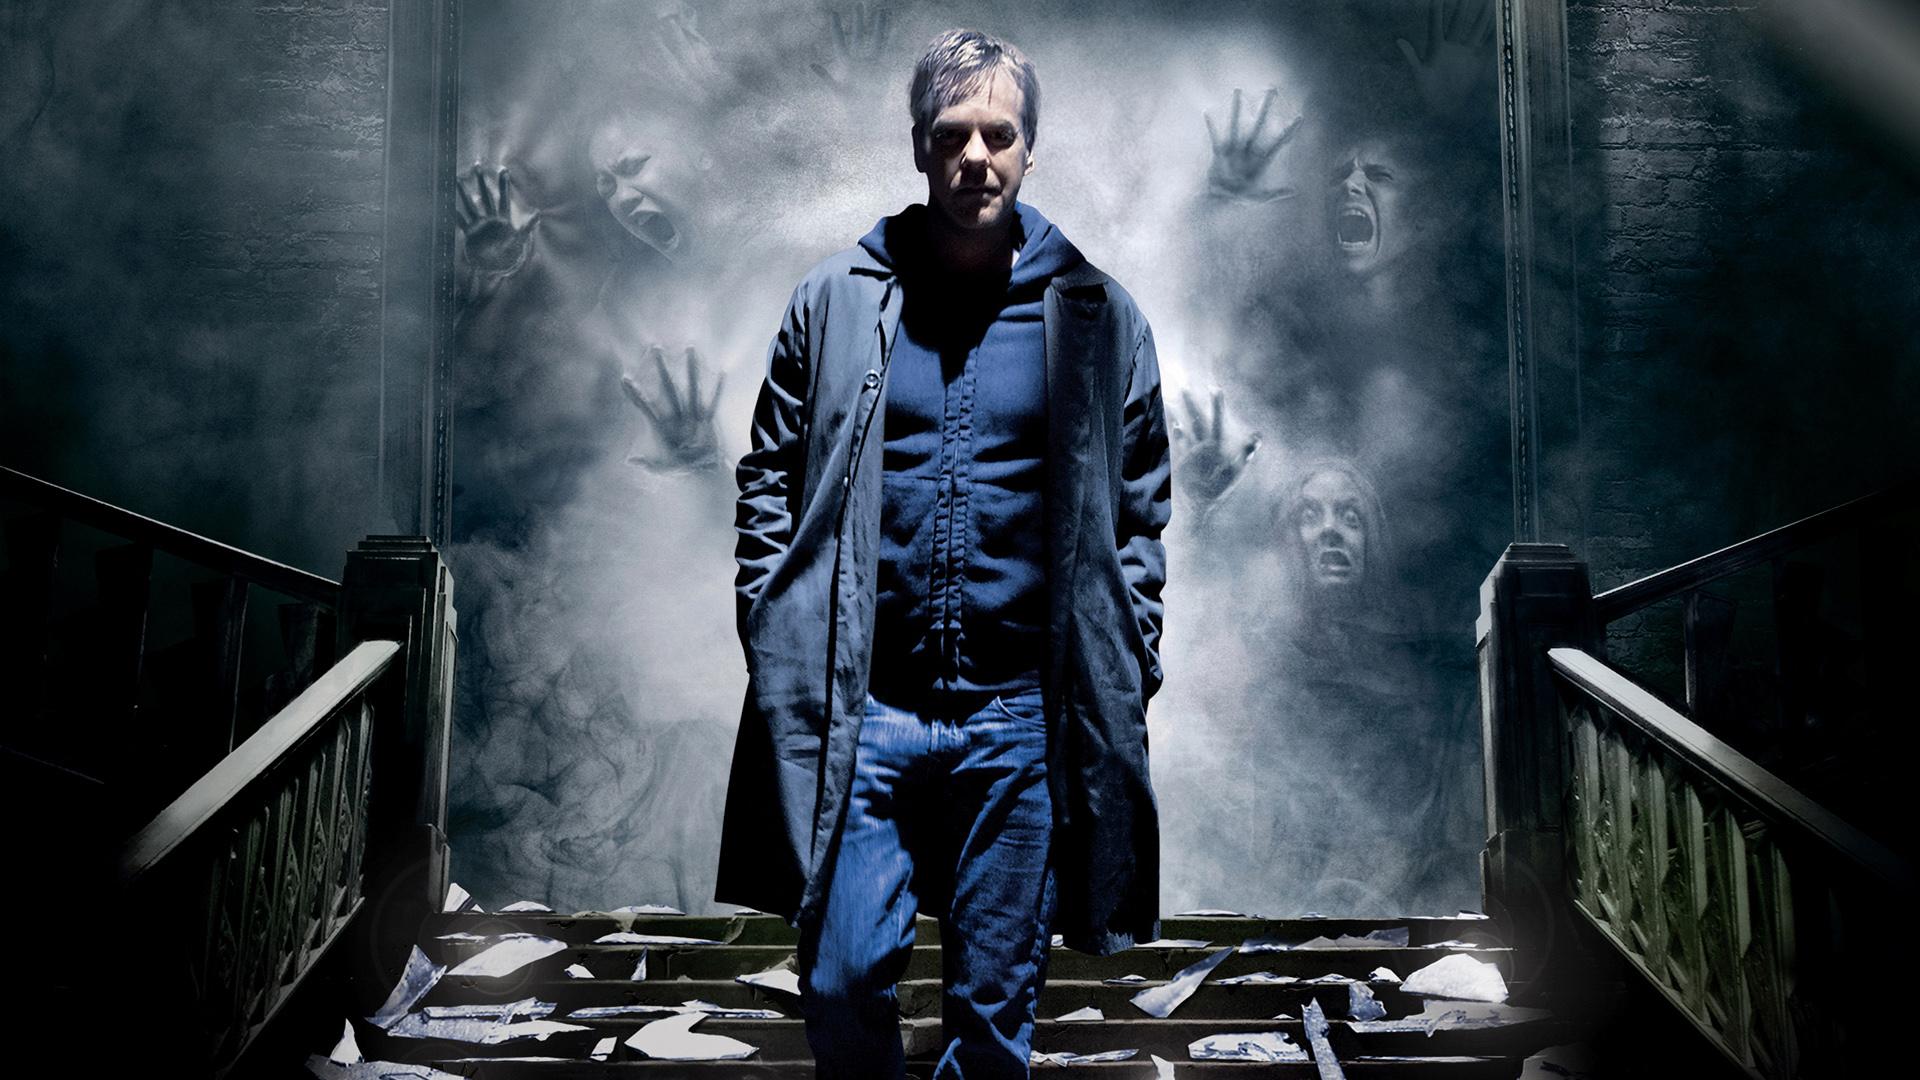 Wallpaper Mirrors, 2008 Horror movie, Kiefer Sutherland